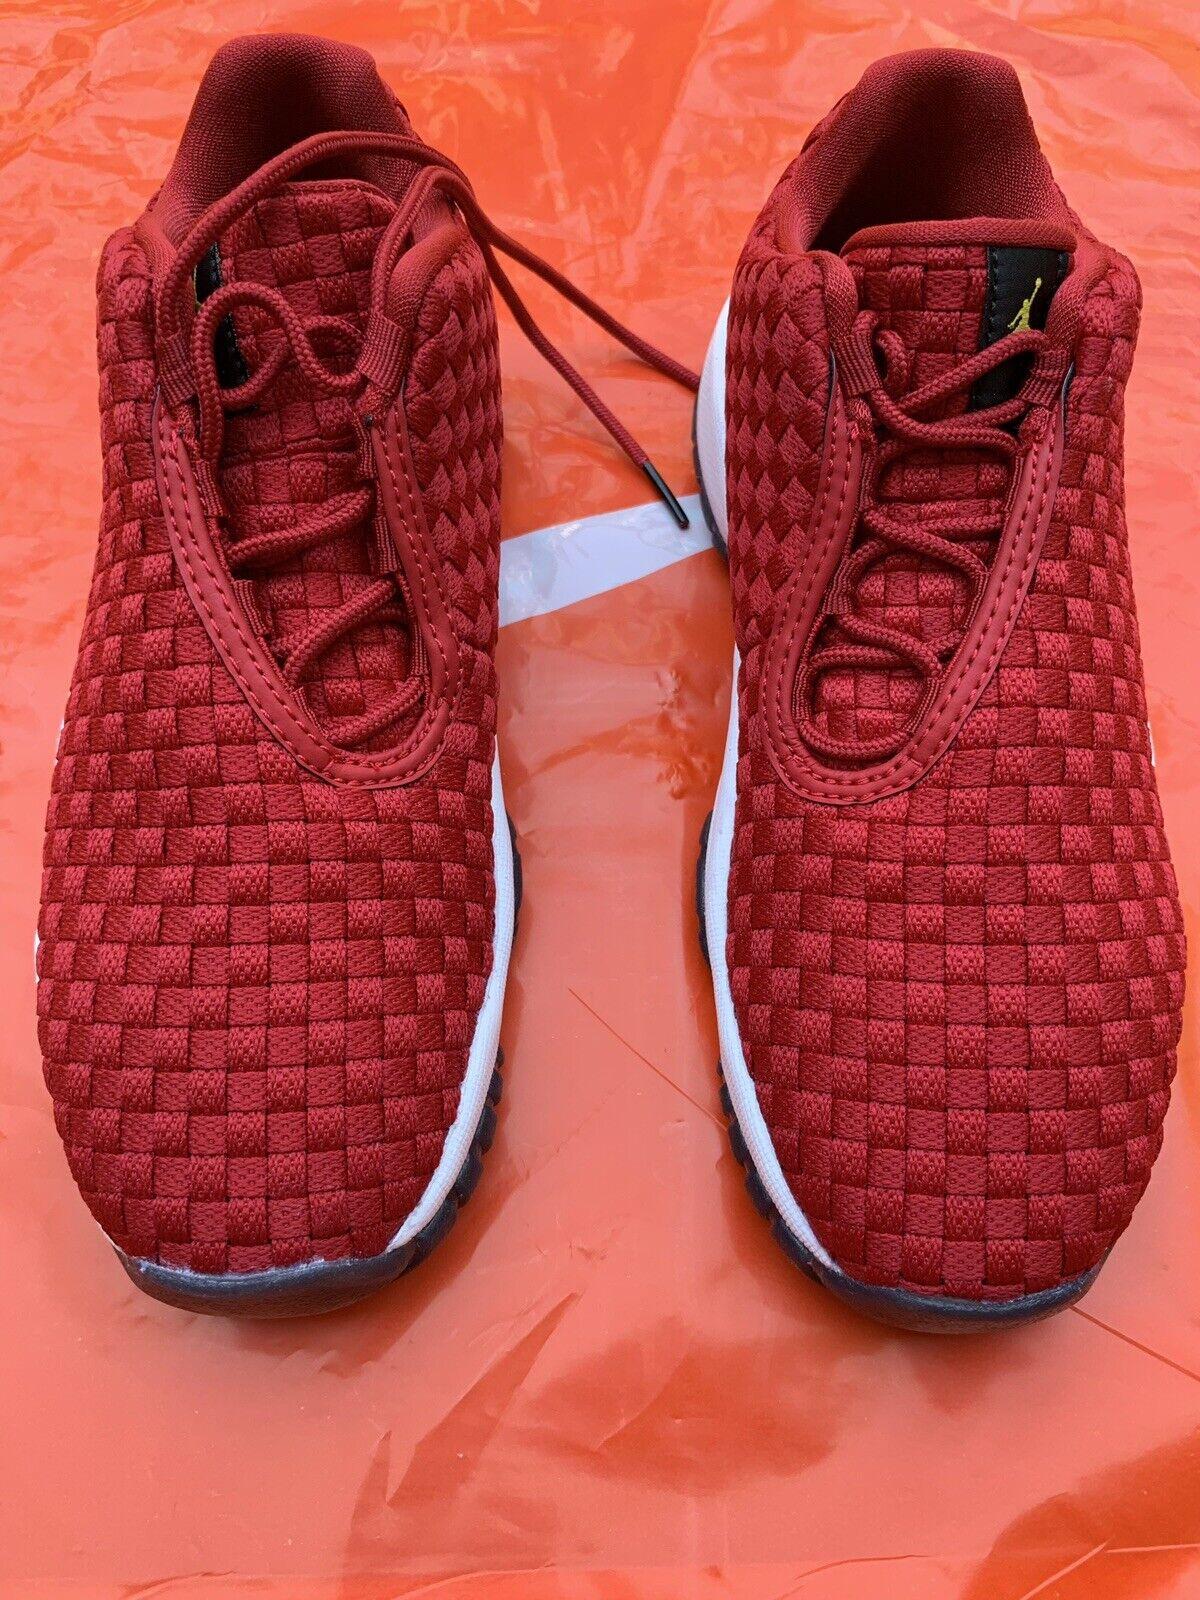 600 Size 4y Air Jordan Basketball Redwhite Nike Kids Future Low 724813 Shoes hrstdQ